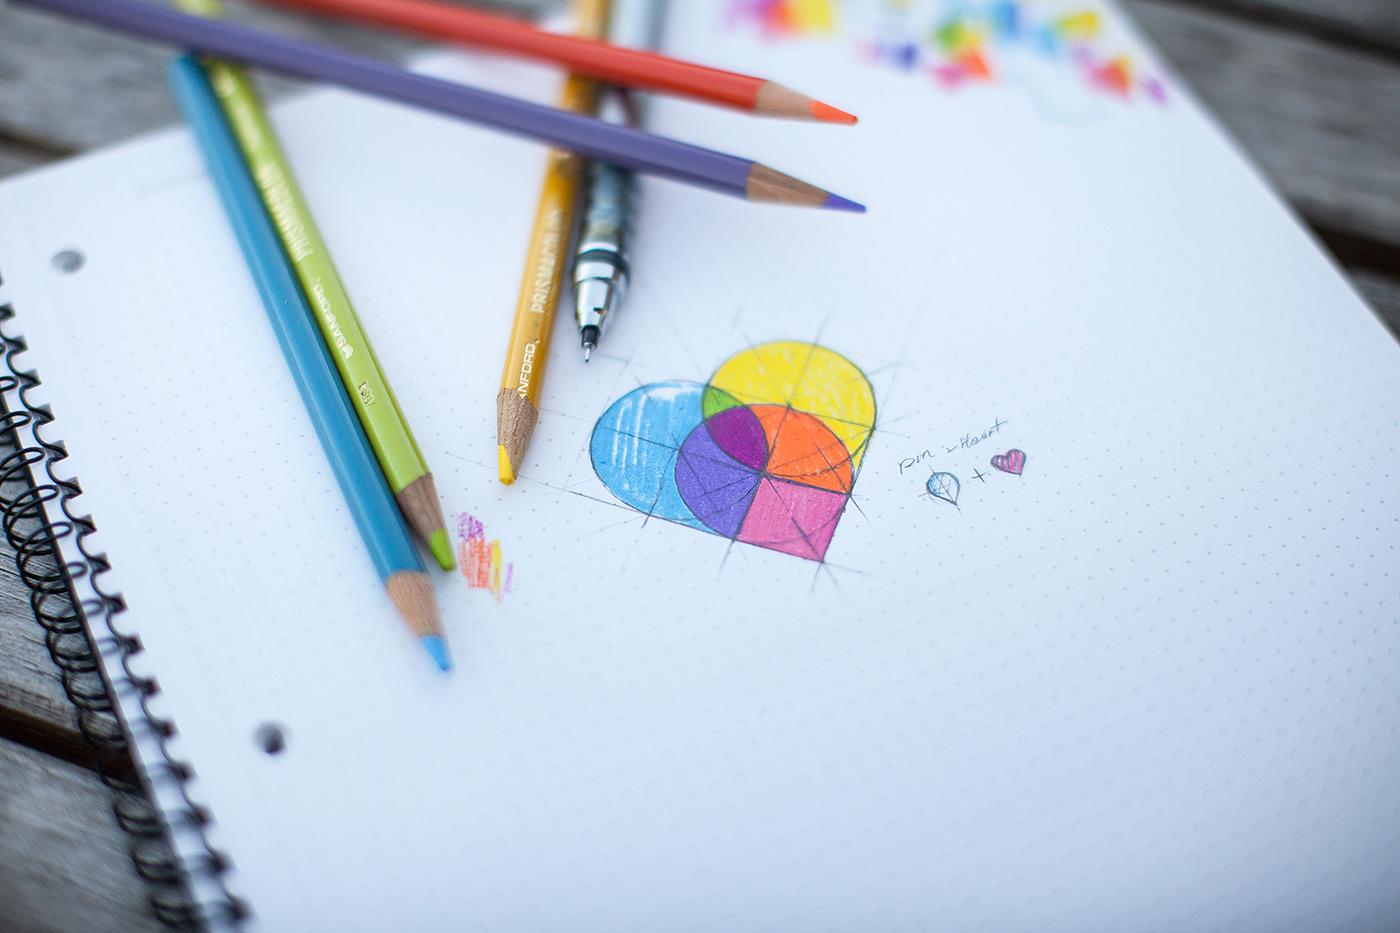 Map pins - heart by Eddie Lobanovskiy